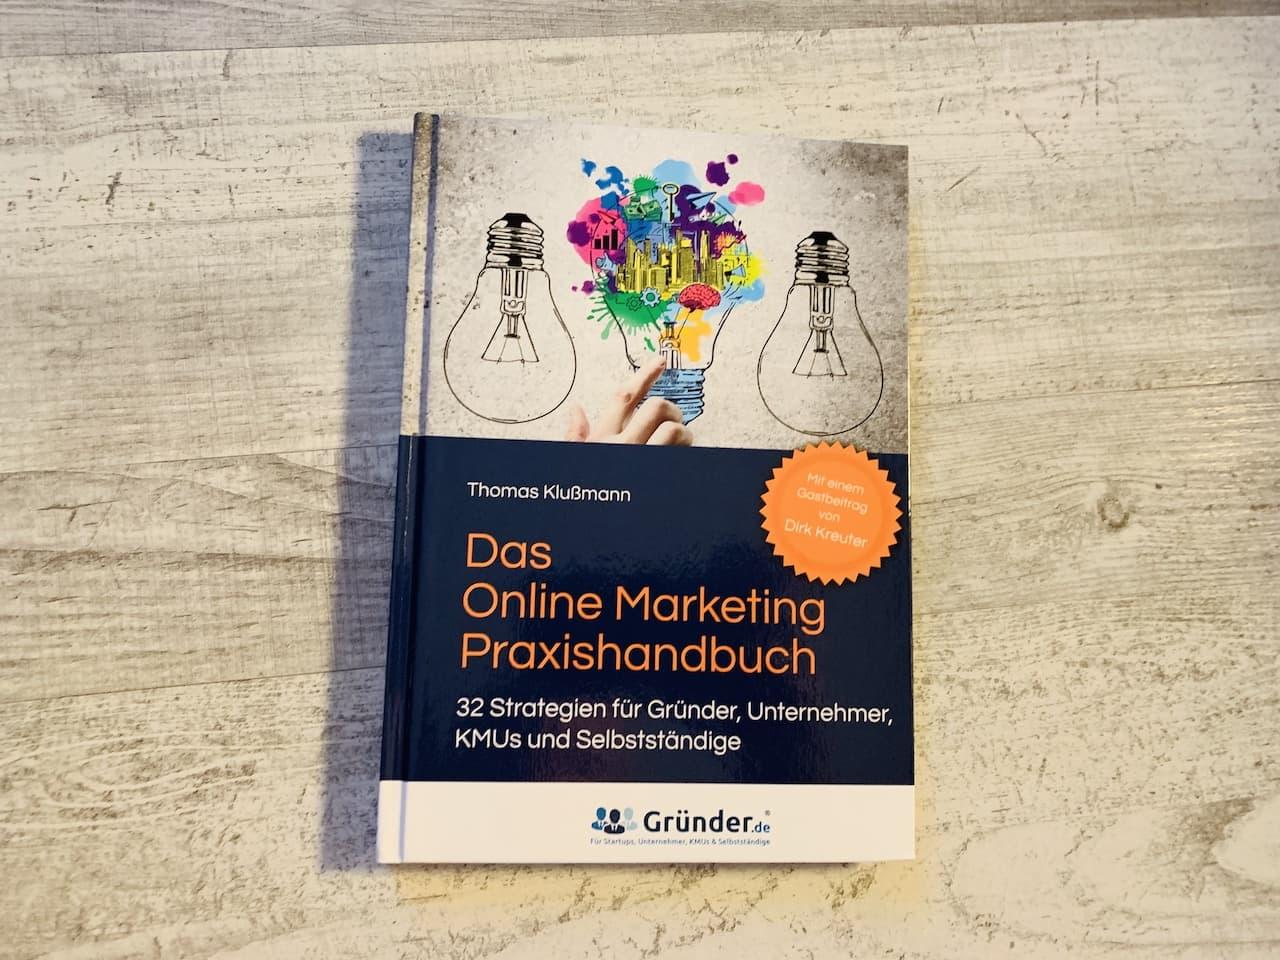 Das Online Marketing Praxishandbuch Cover